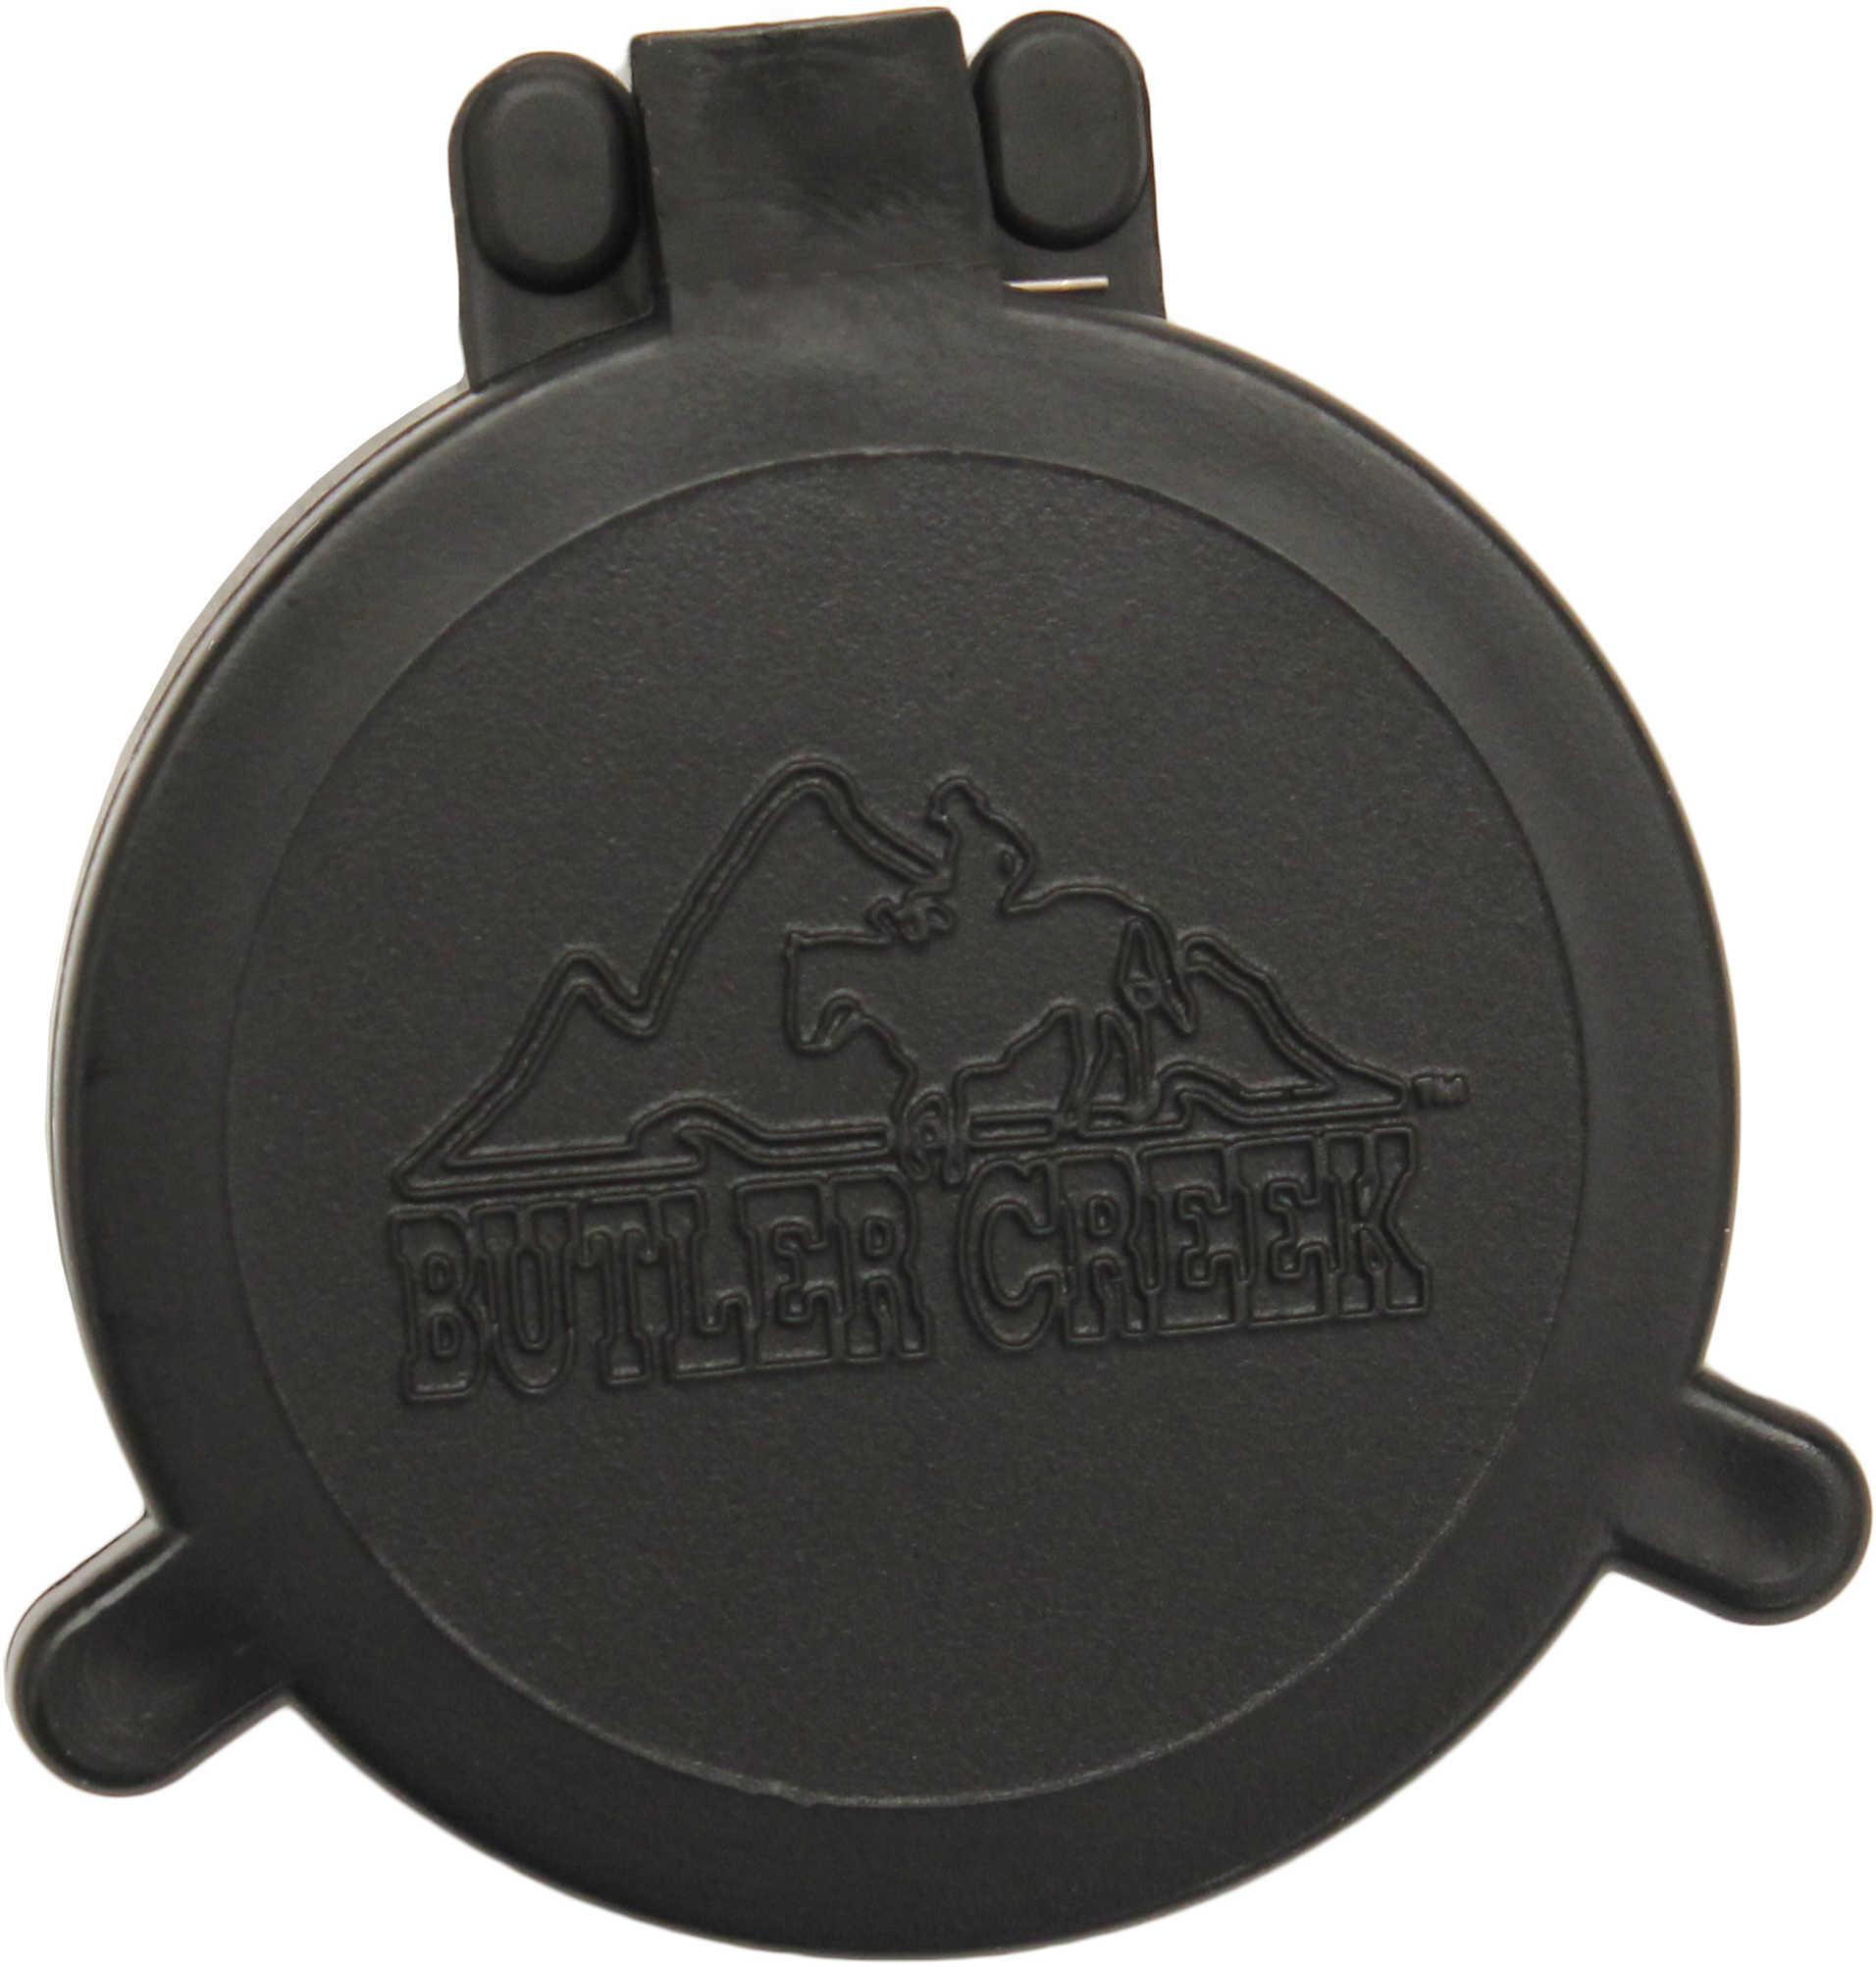 Butler Creek Flip Open Scope Cover - Objective Size 10 Md: 30100